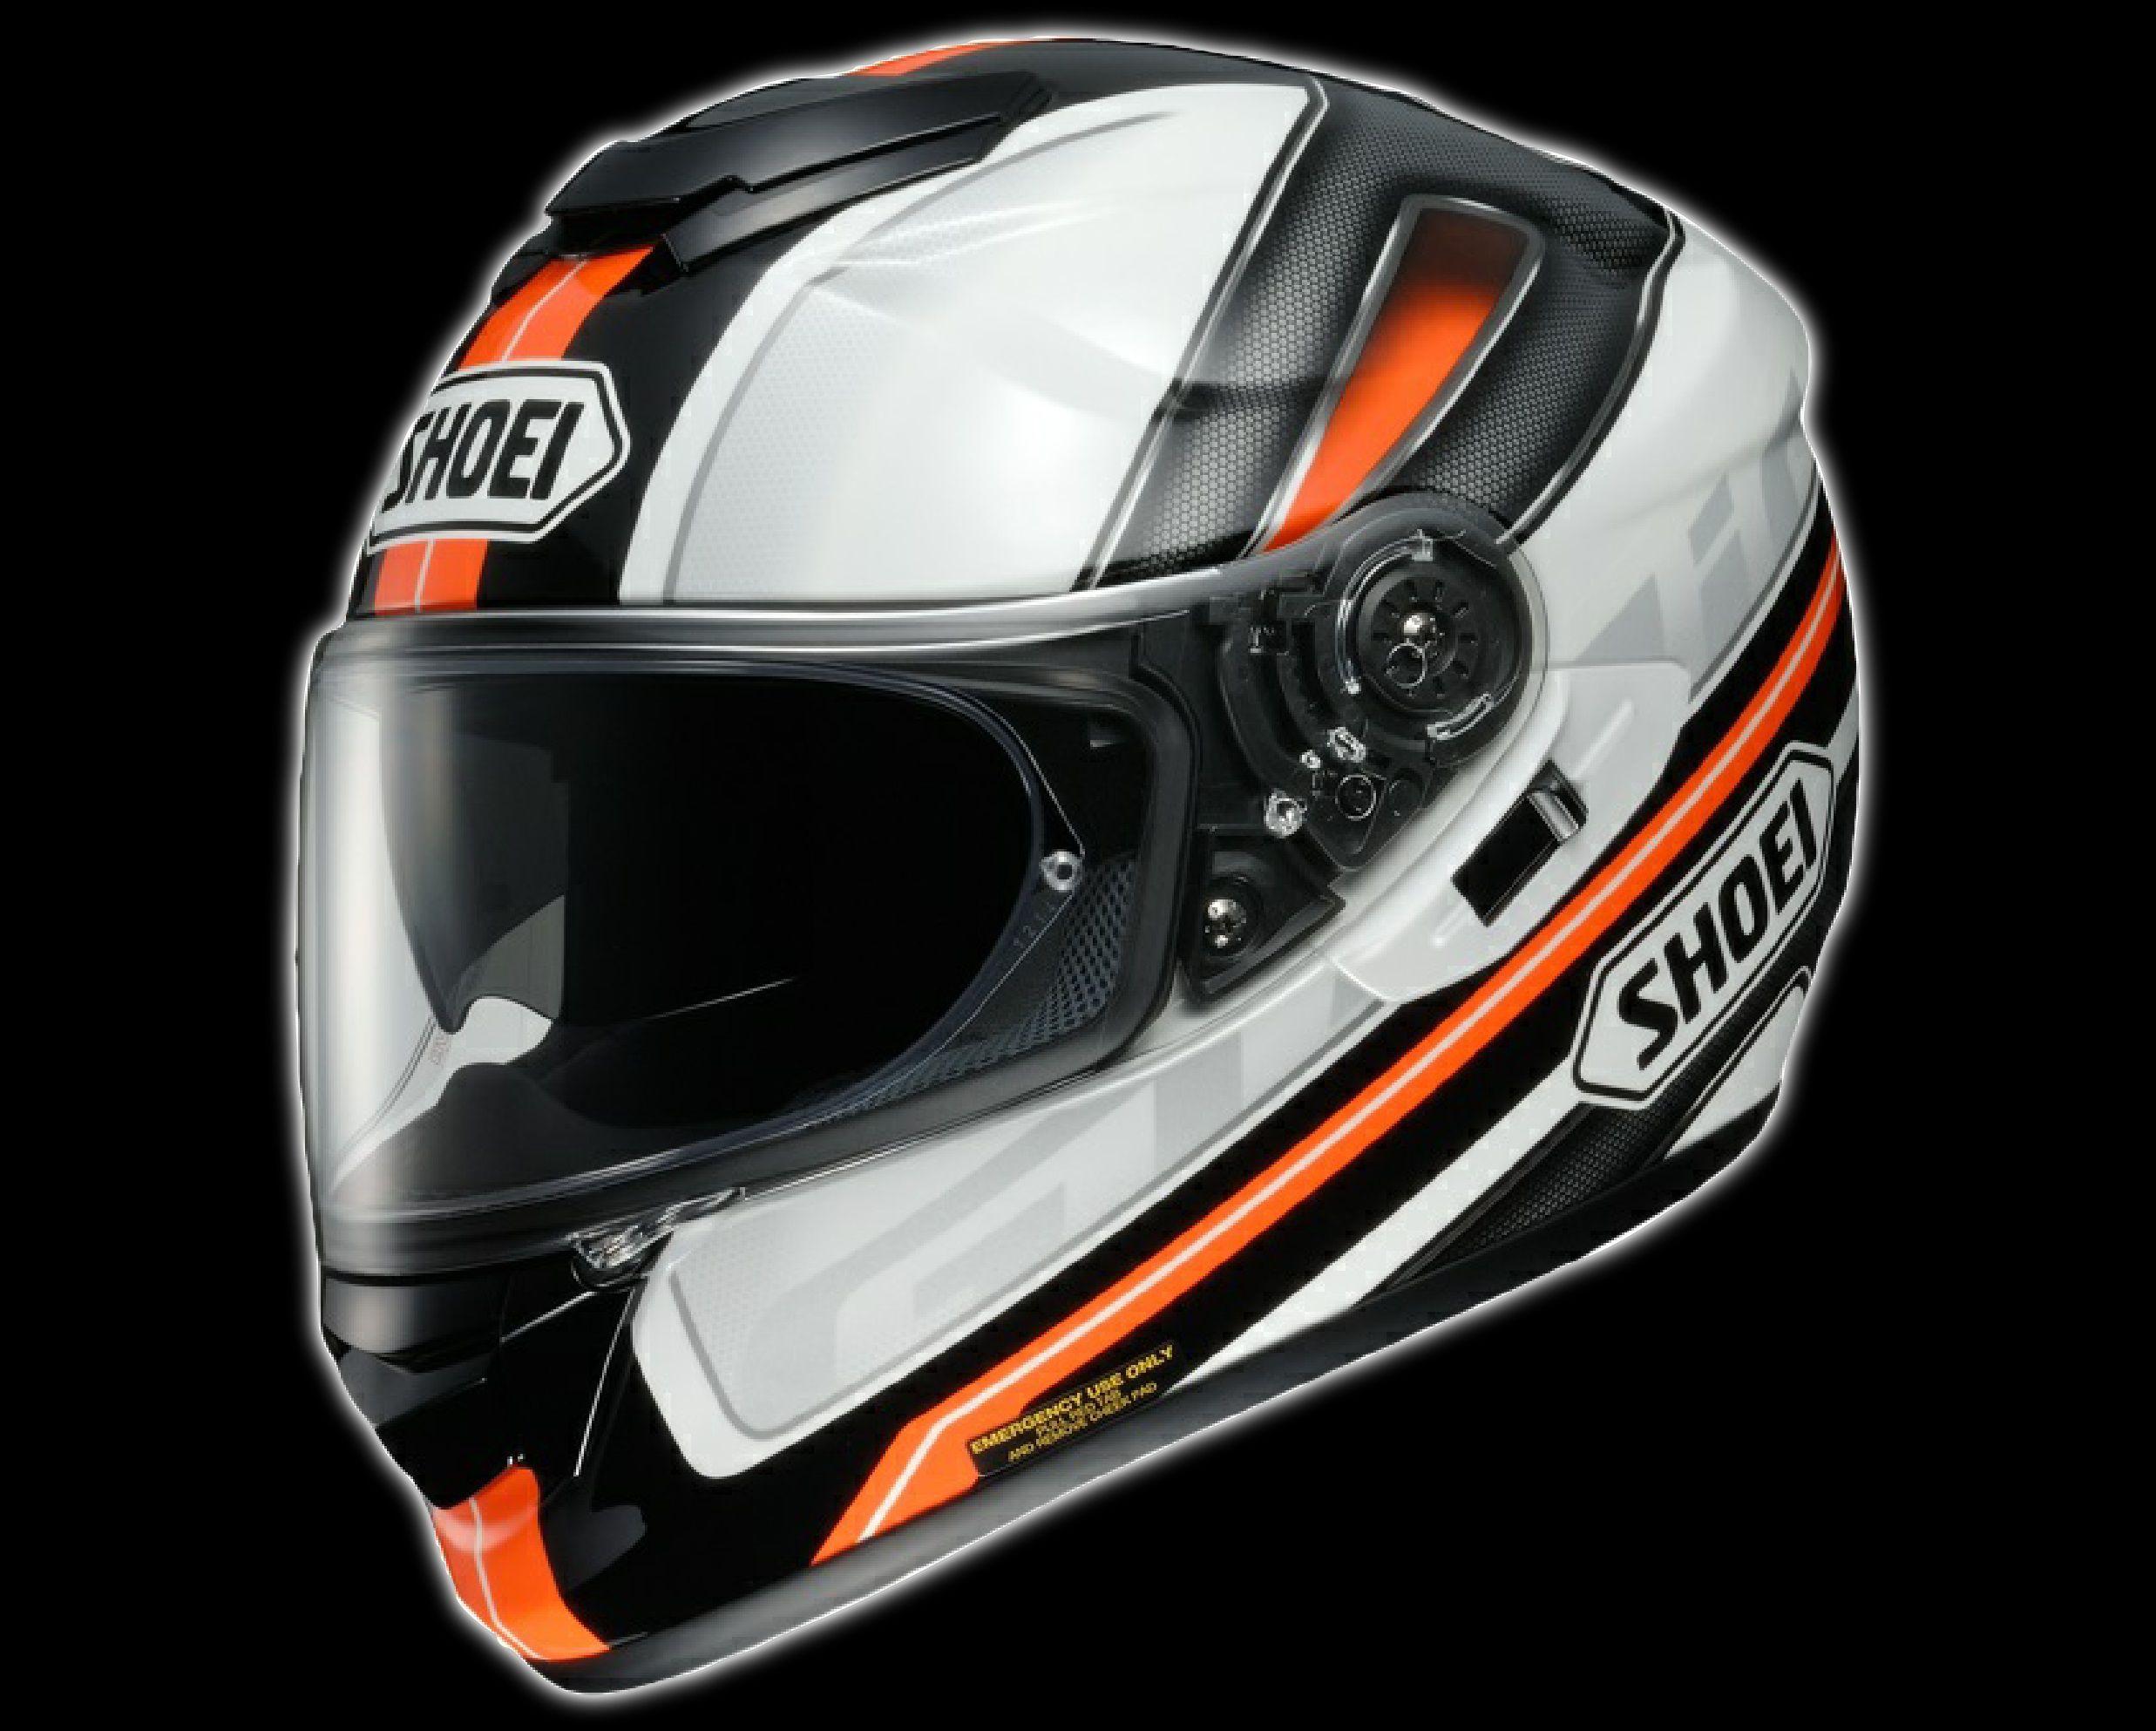 89845642 Shoei GT-Air Dauntless TC-8 Helmet #Dauntless #TC-8 #Shoei #GT-AIR #GTair